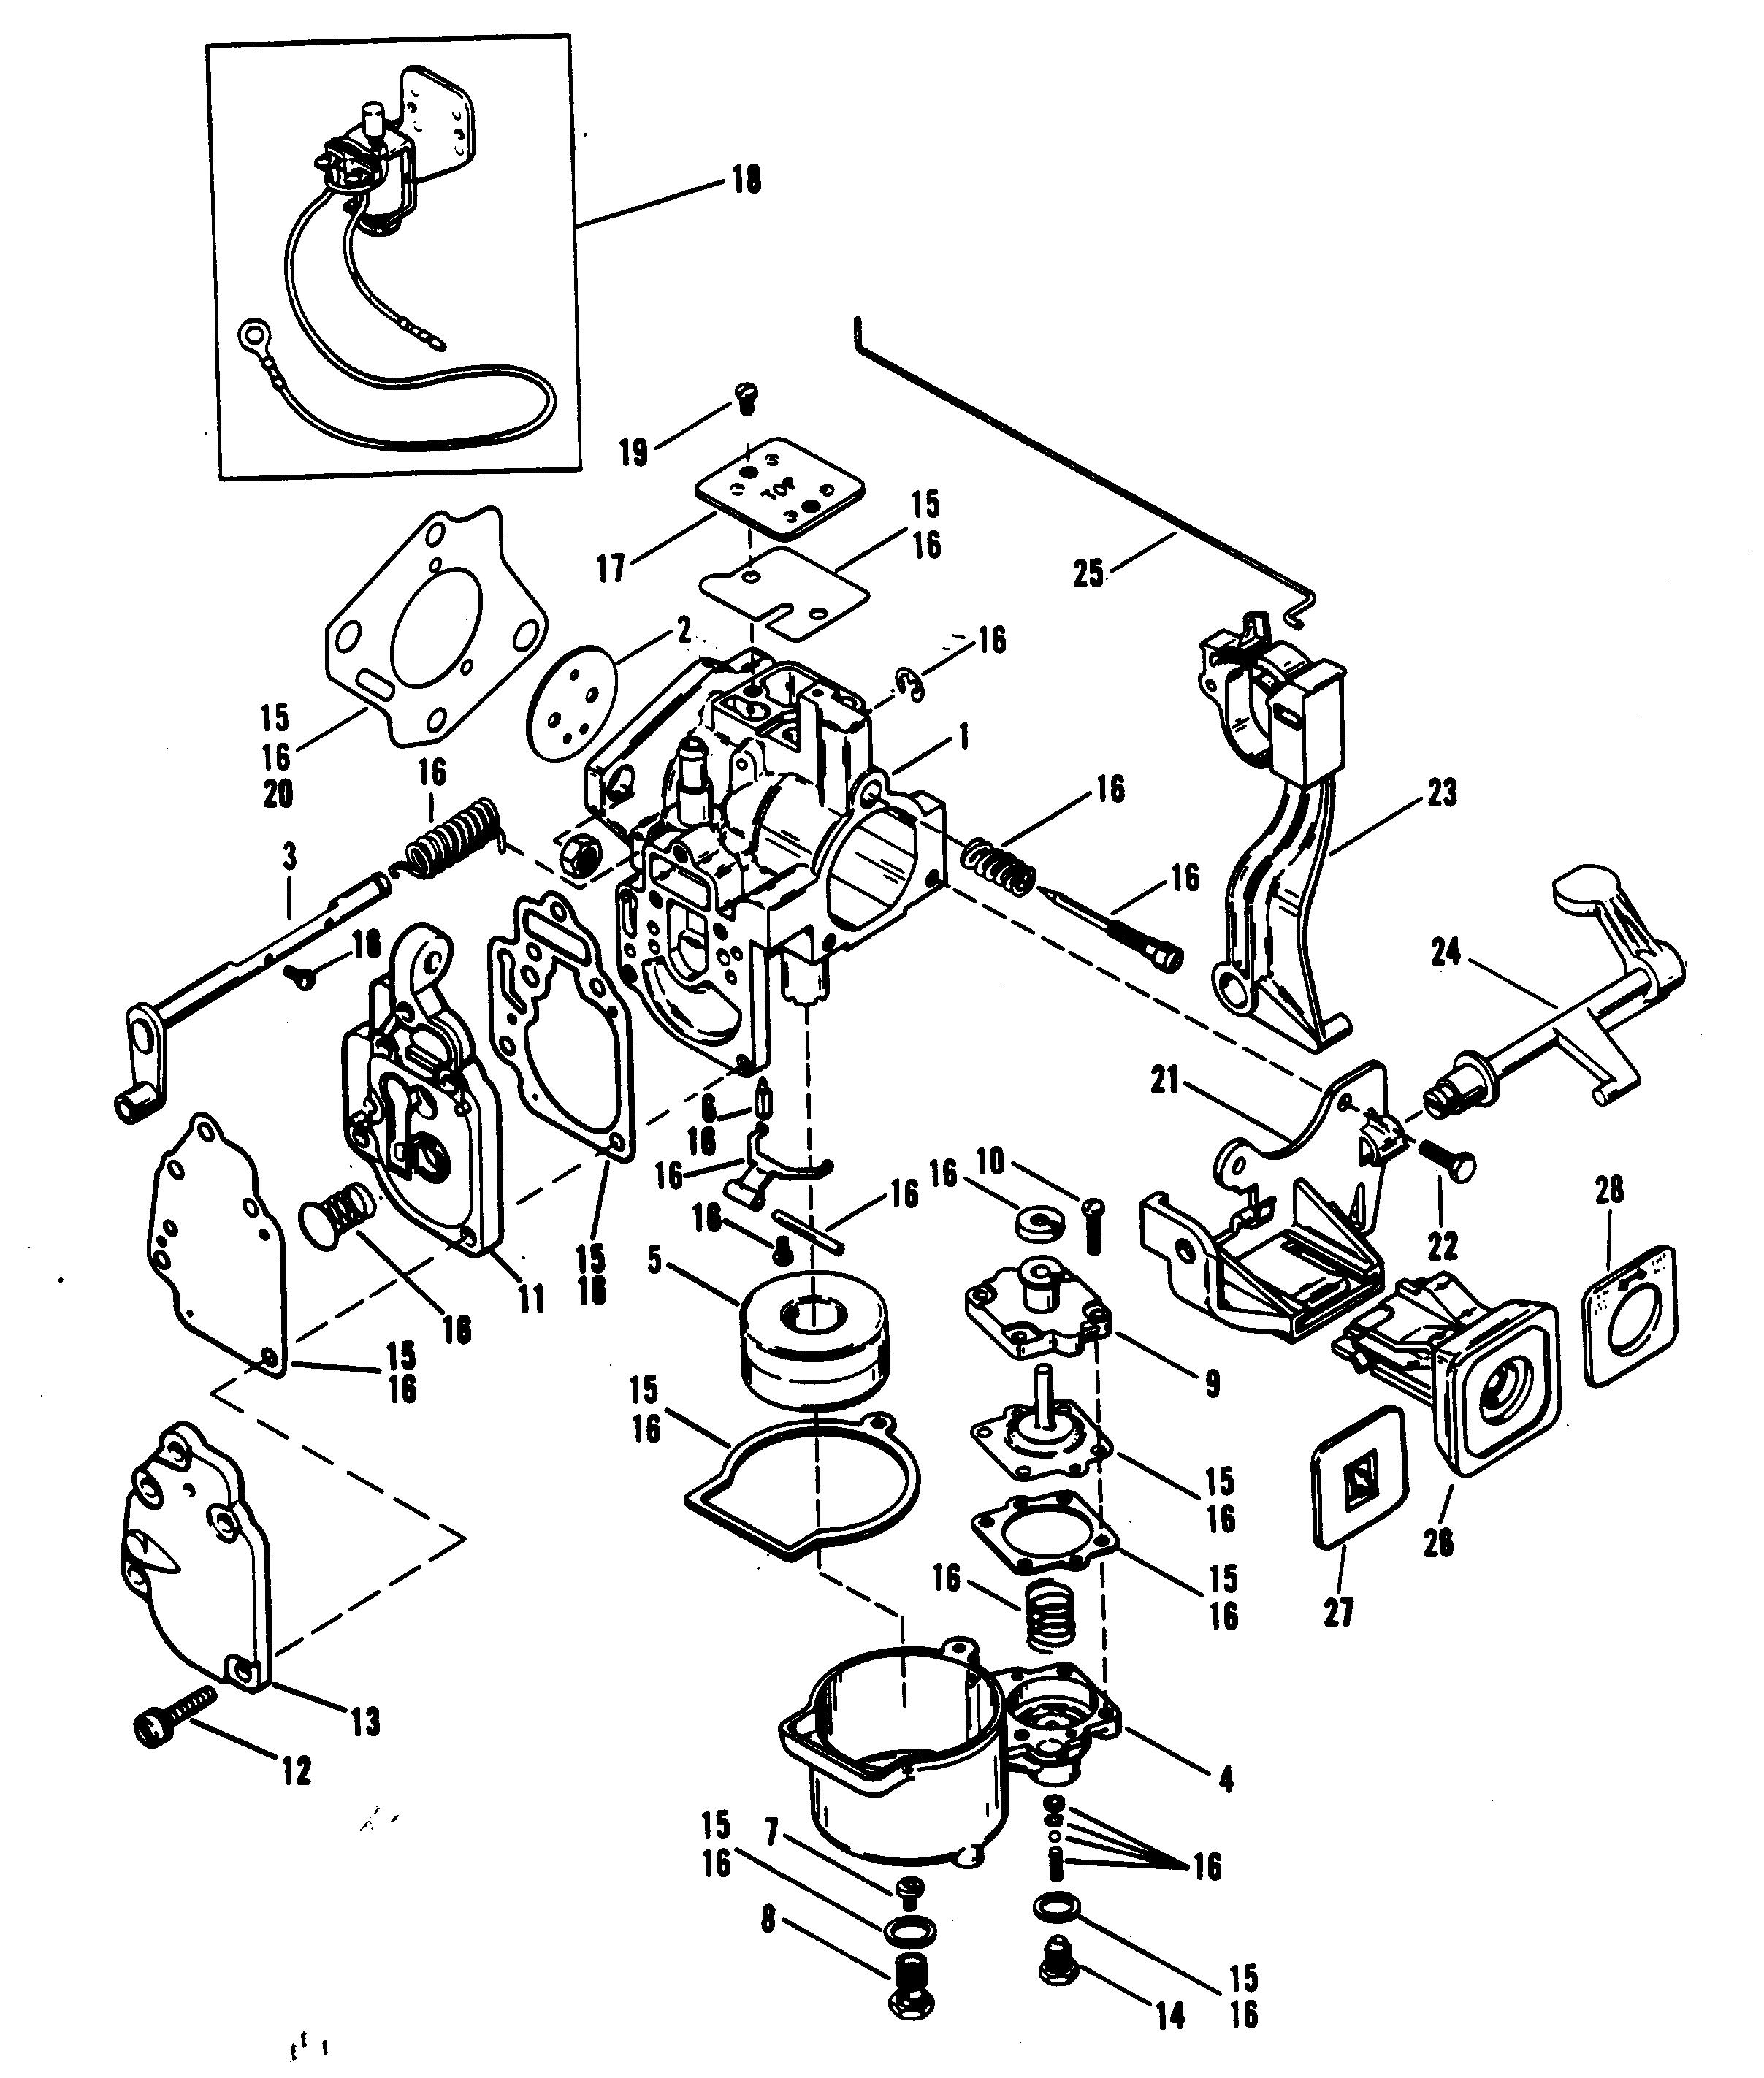 Outboard motors parts mercury honda 70 wiring diagram at free freeautoresponder co